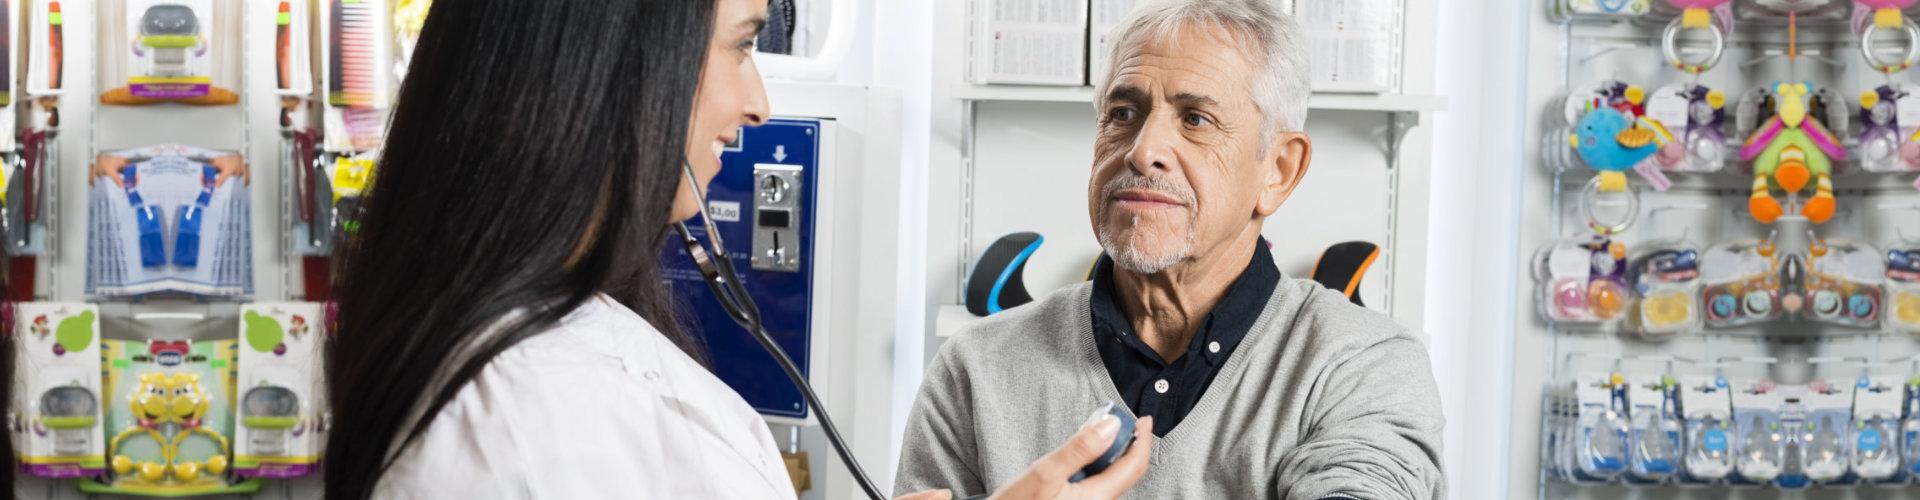 senior man getting his blood pressure tested